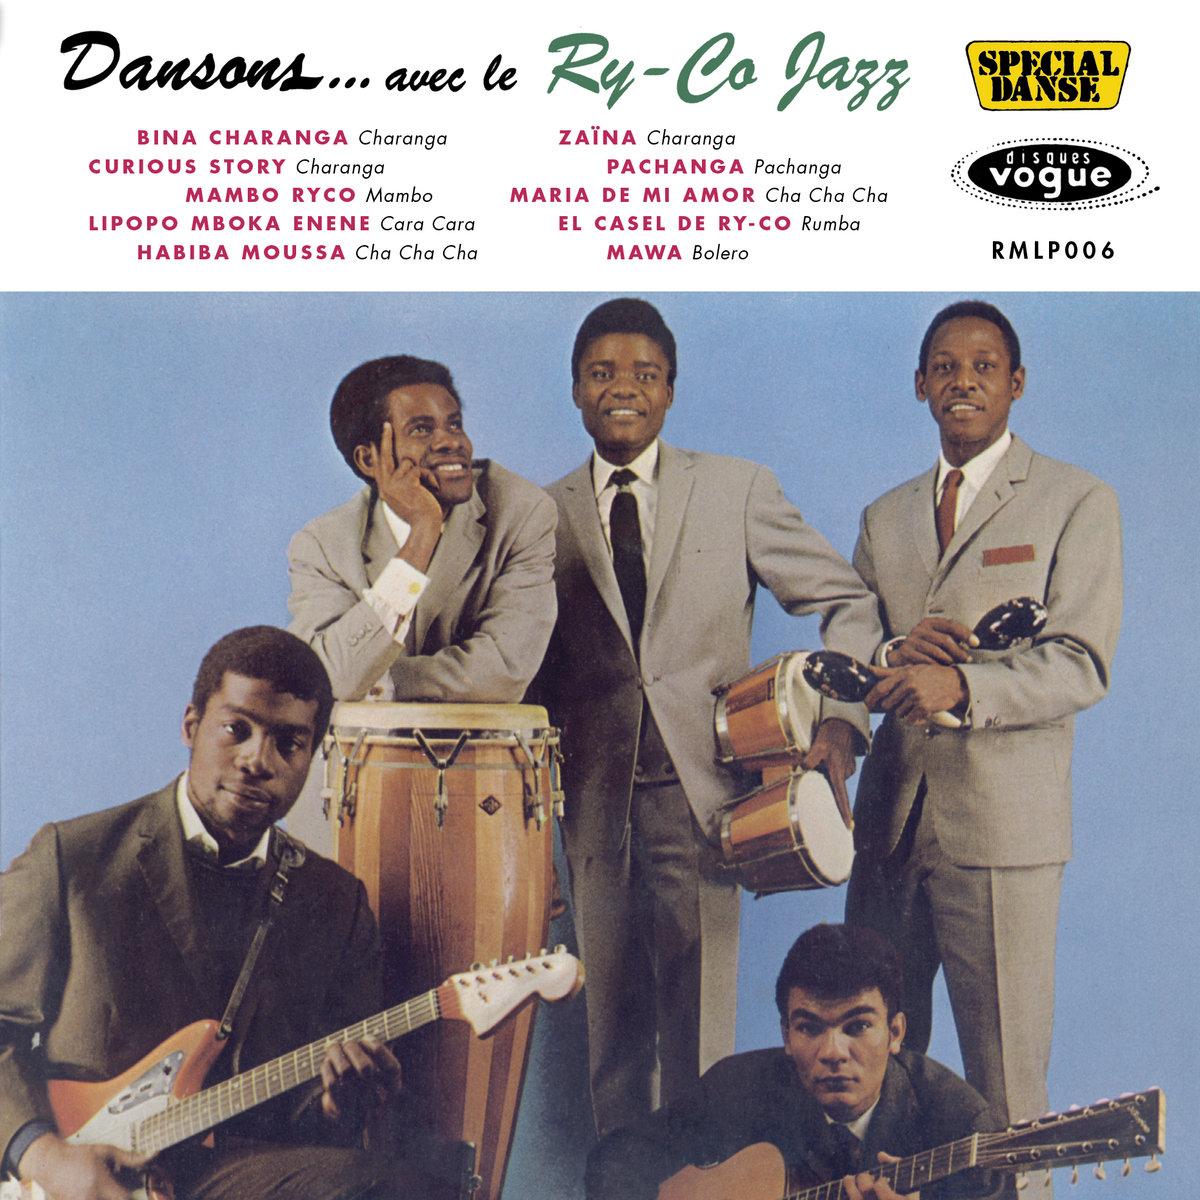 Dansons avec le Ry-co Jazz | Ry-co Jazz